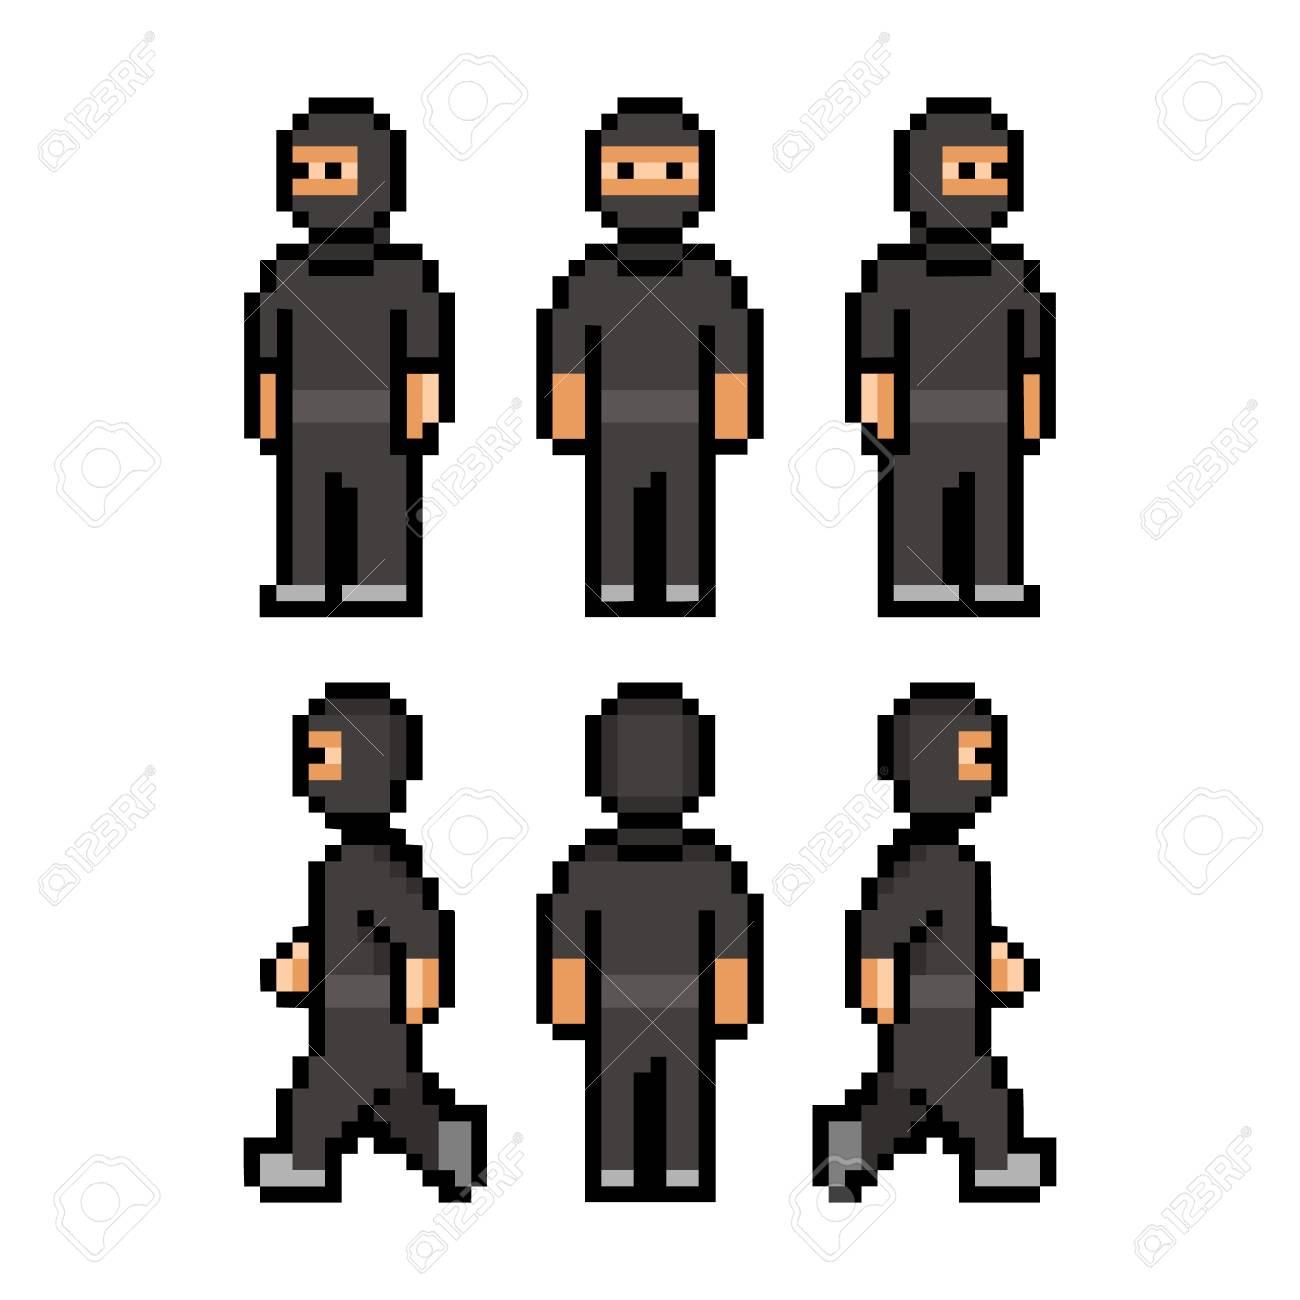 Pixel Art Funny Black Ninja For Games